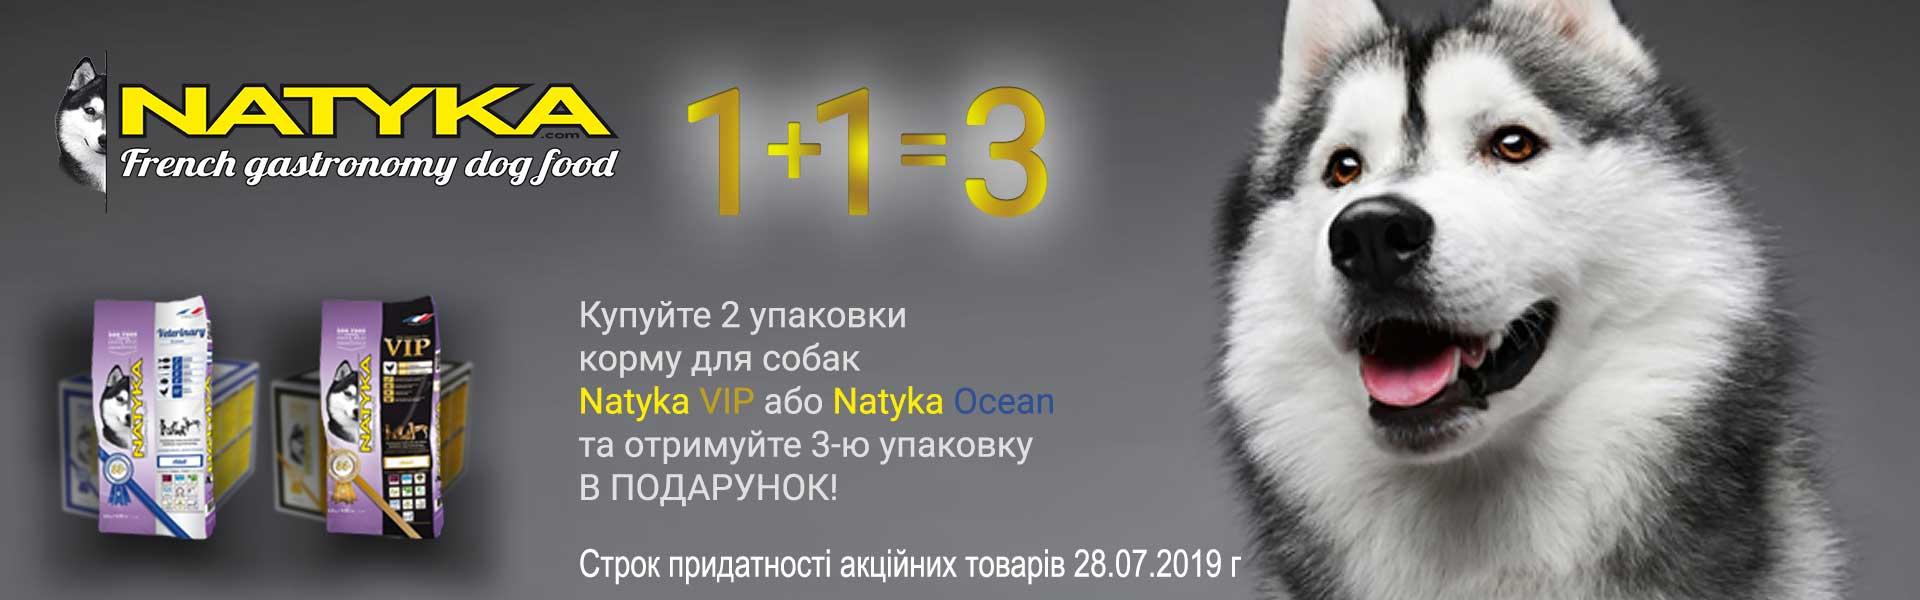 Natyka для собак акция